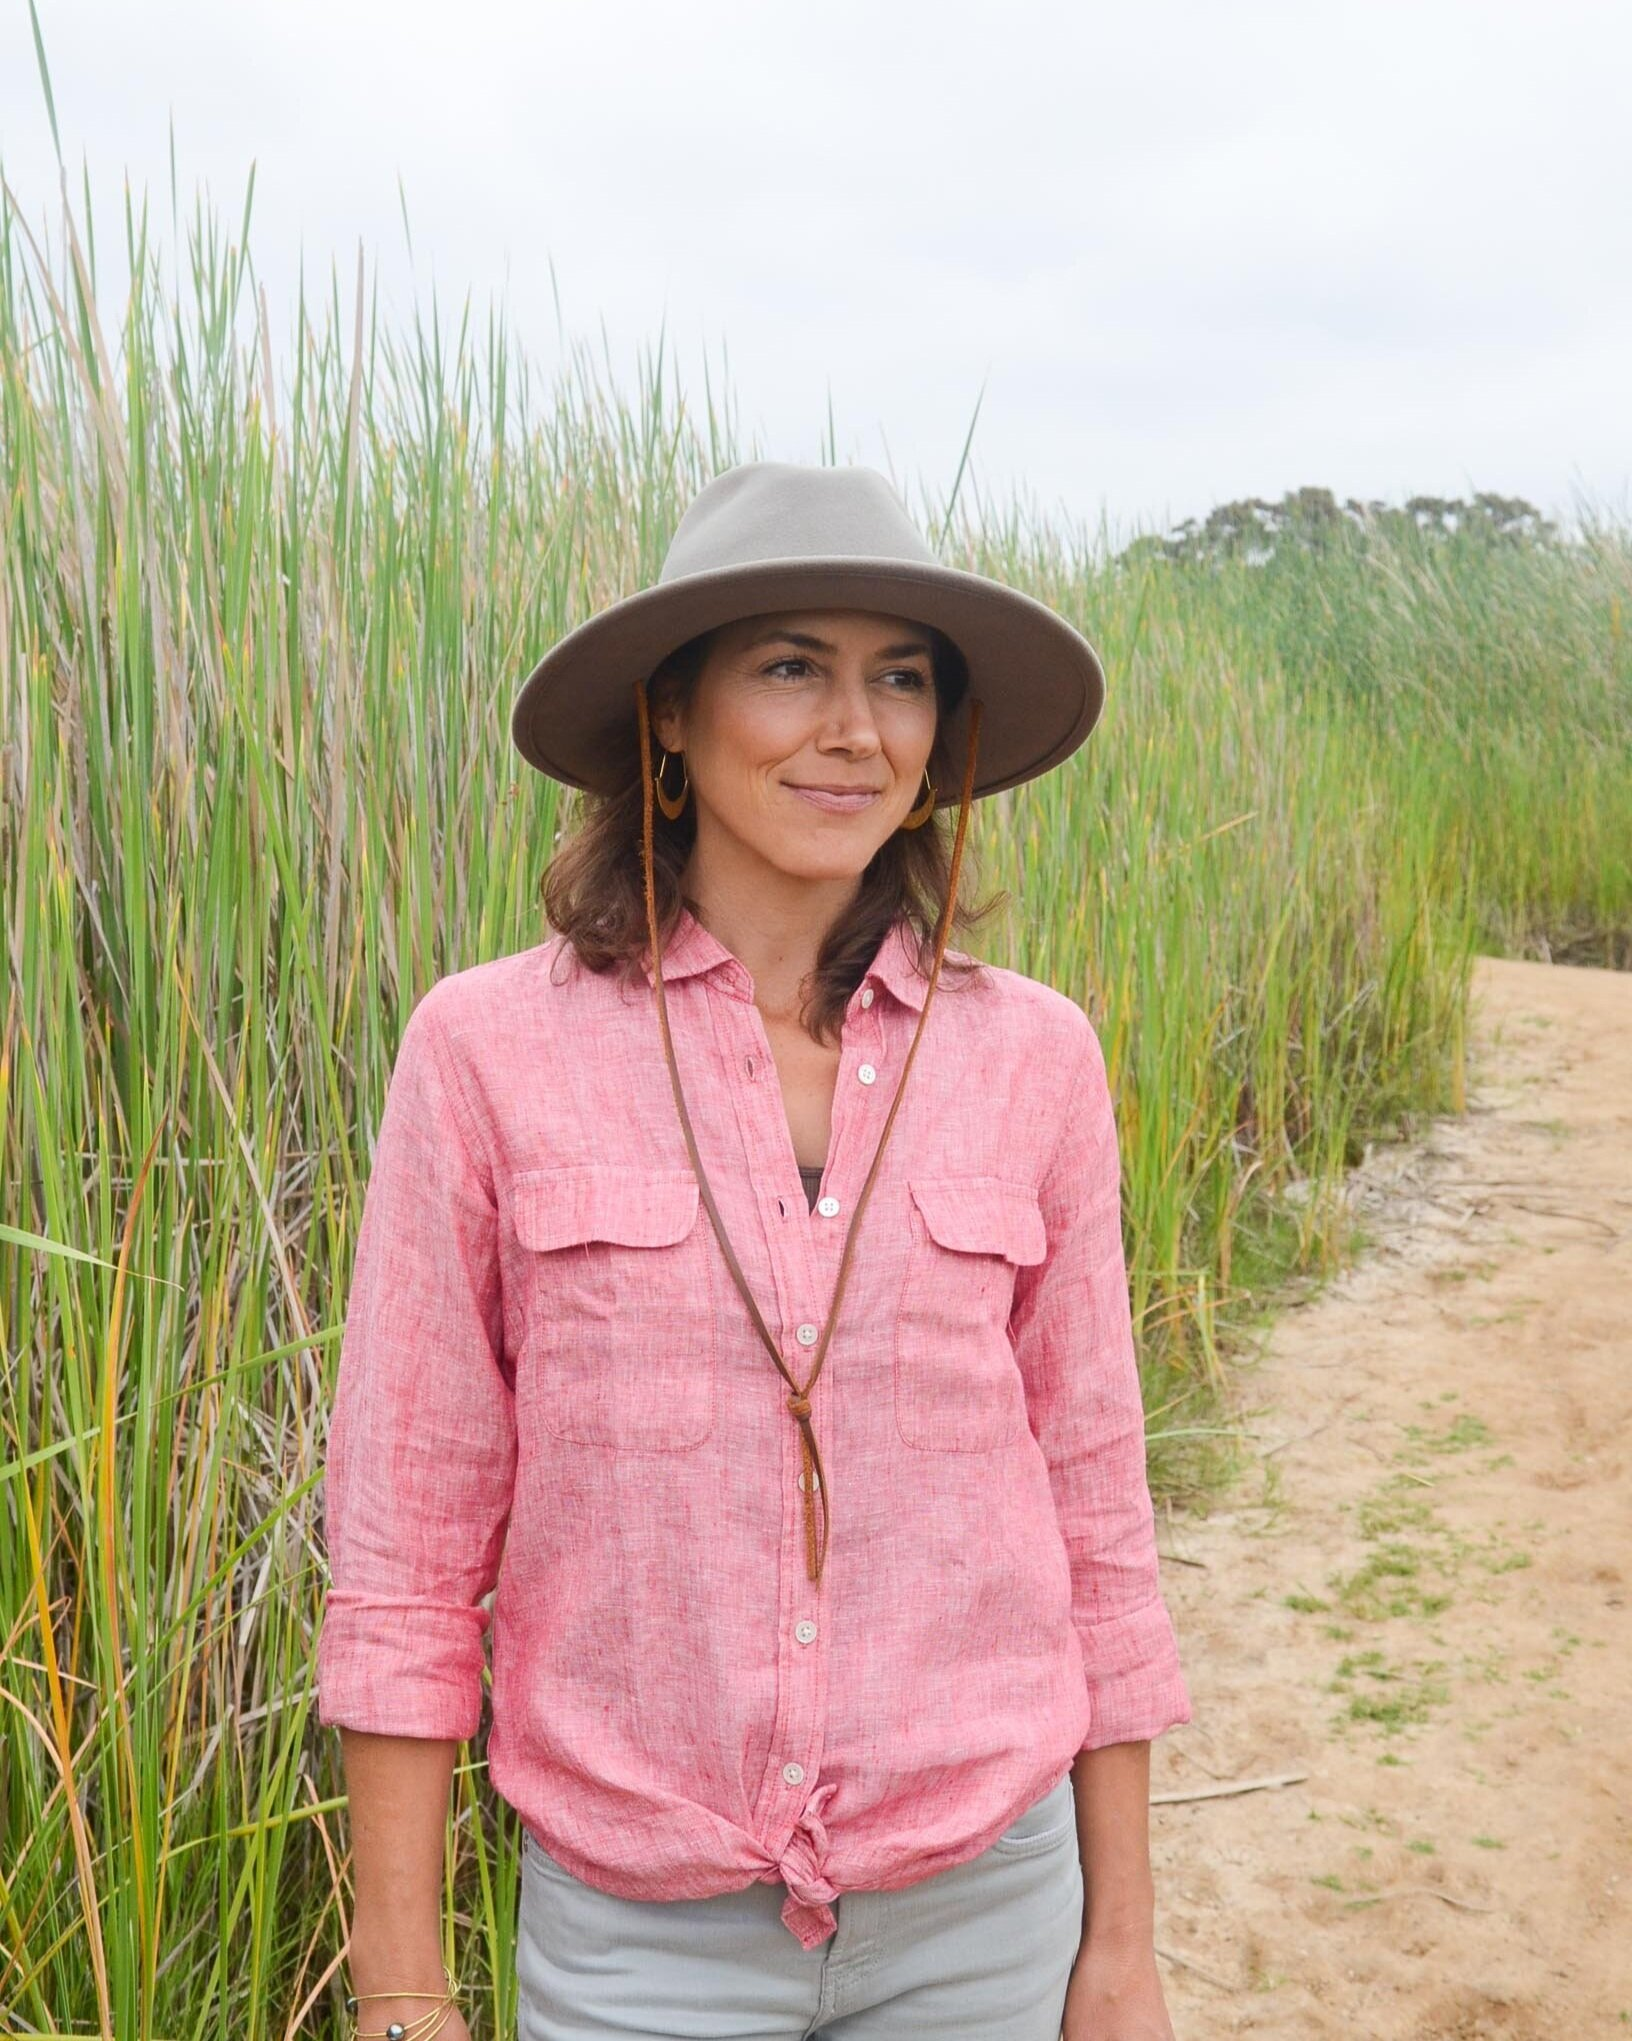 The Nomad Jeweler - Jessica Hudson, Founder